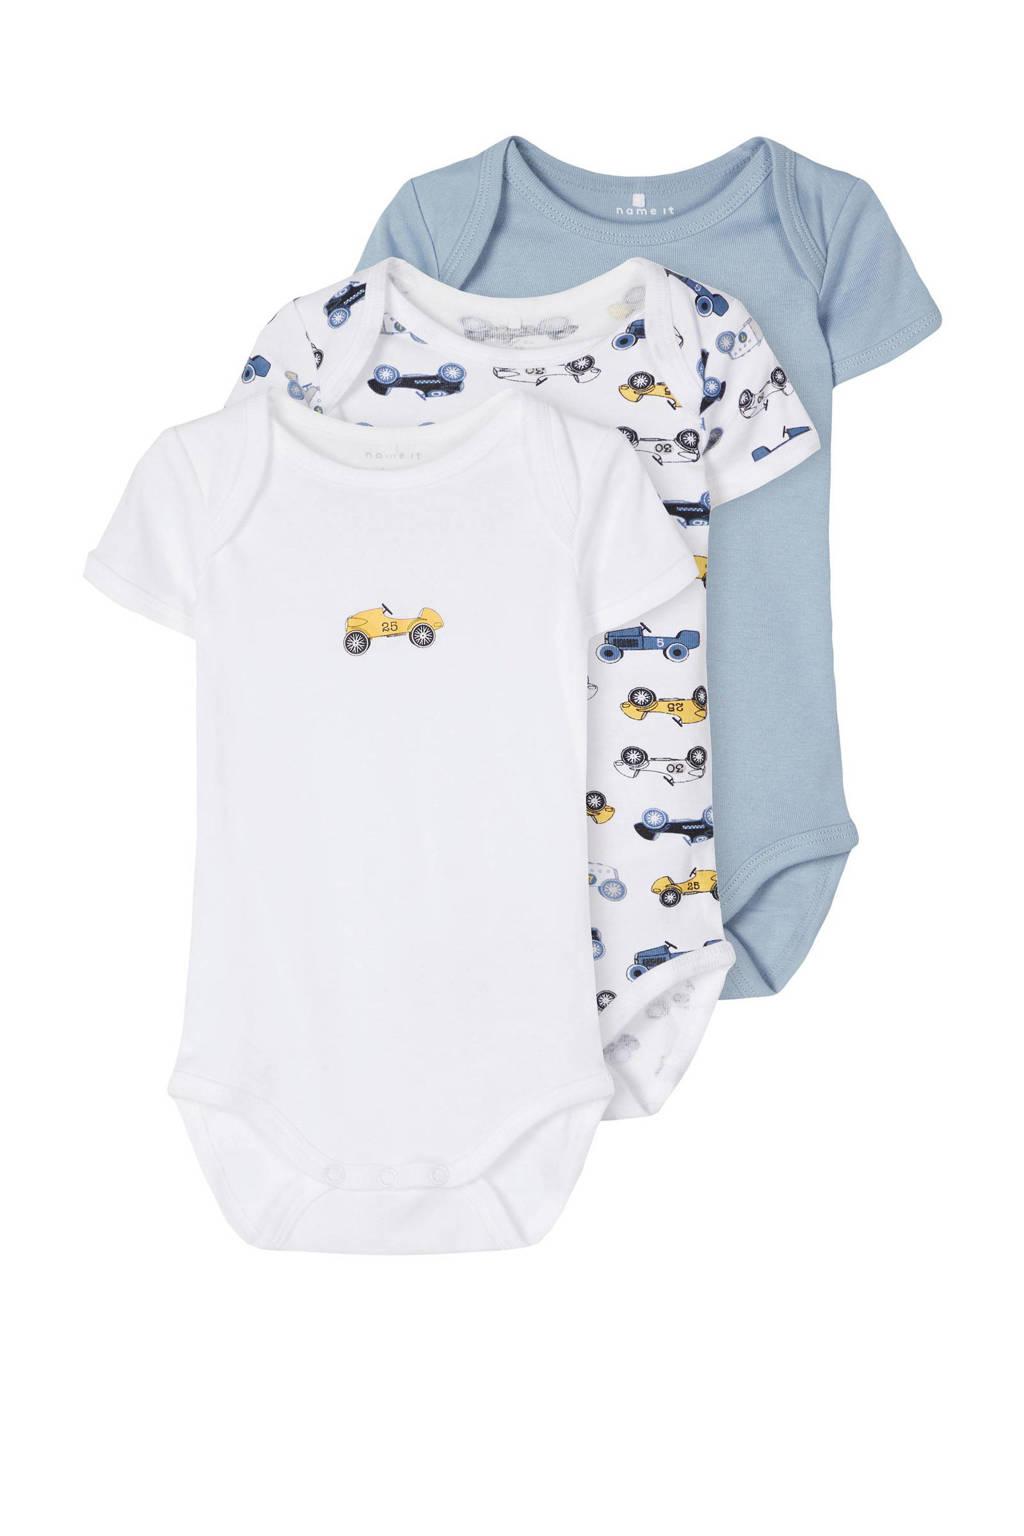 NAME IT BABY romper - set van 3 auto's blauw/wit, Lichtblauw/wit